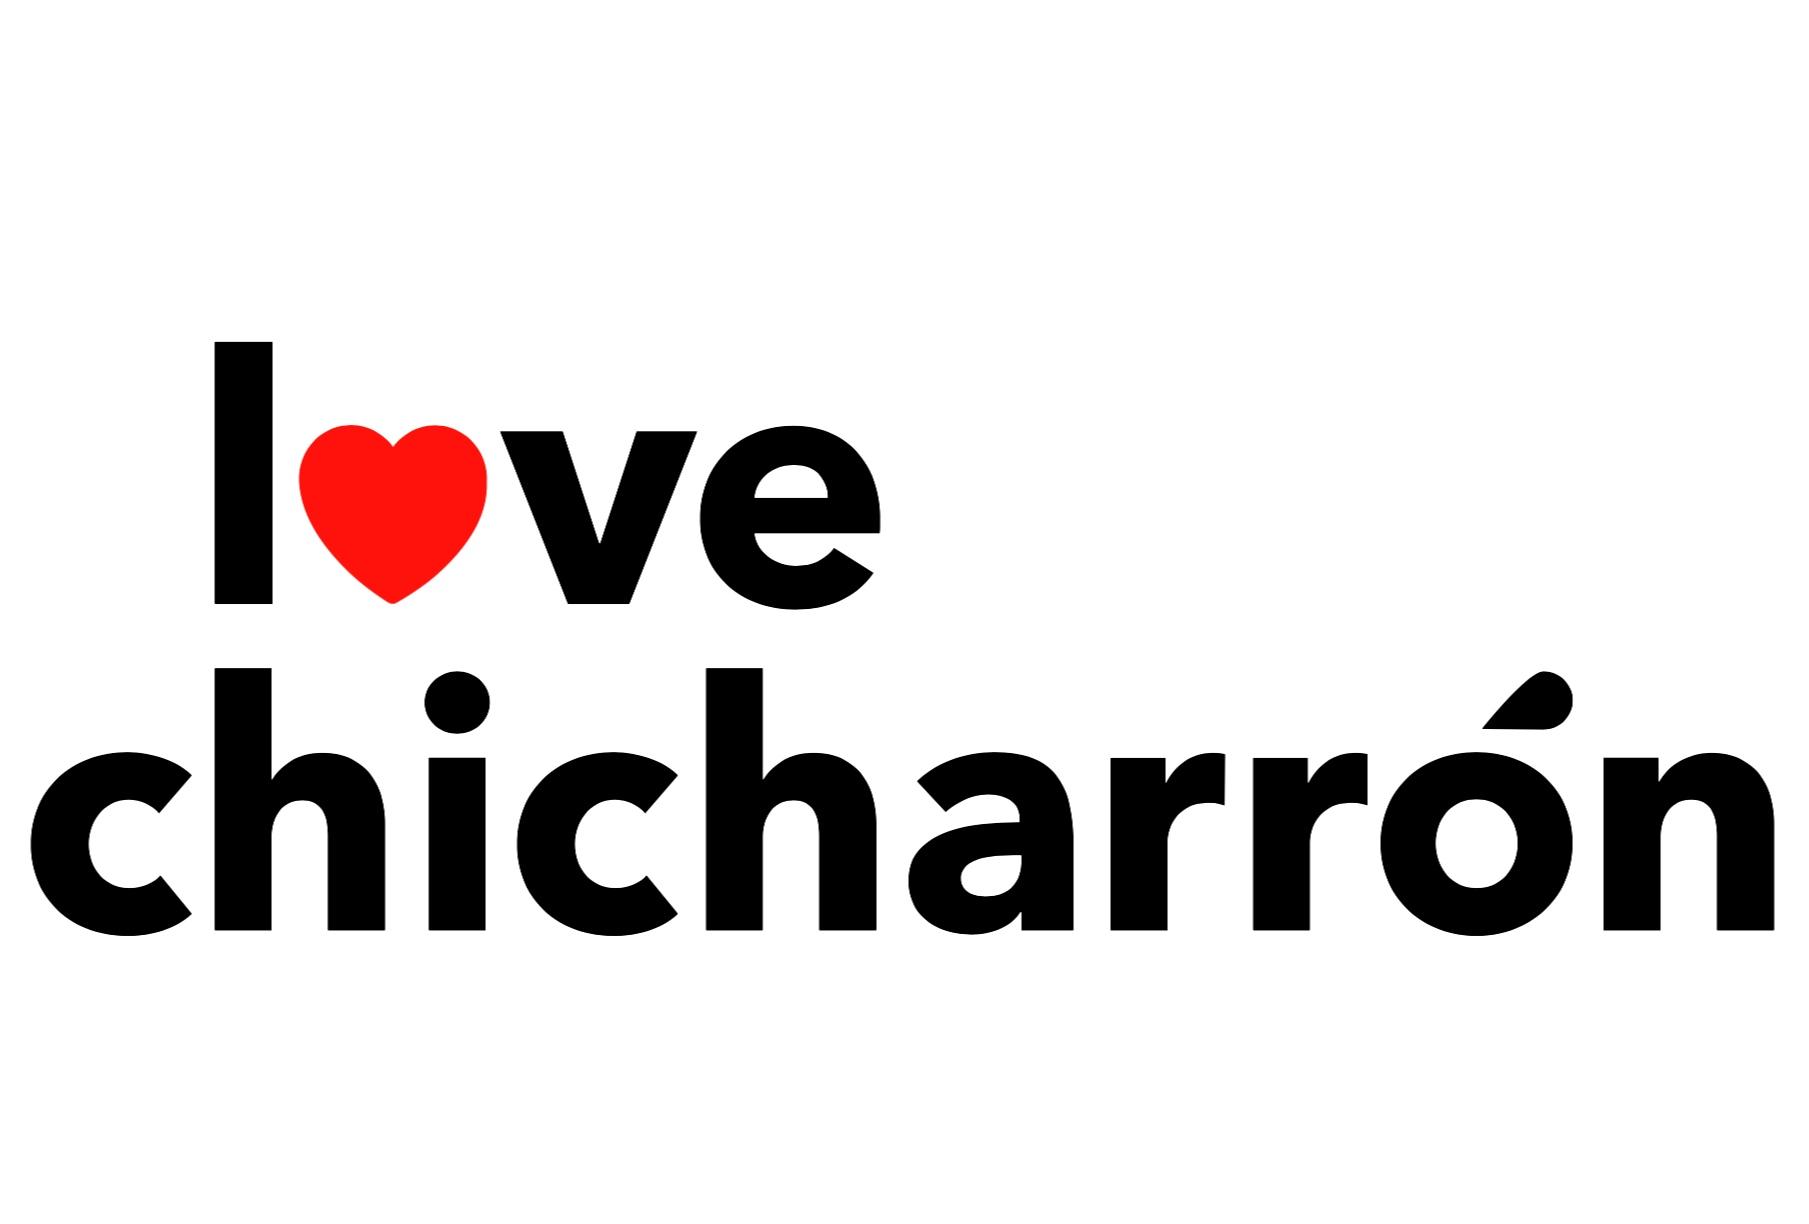 Love Chicharrón